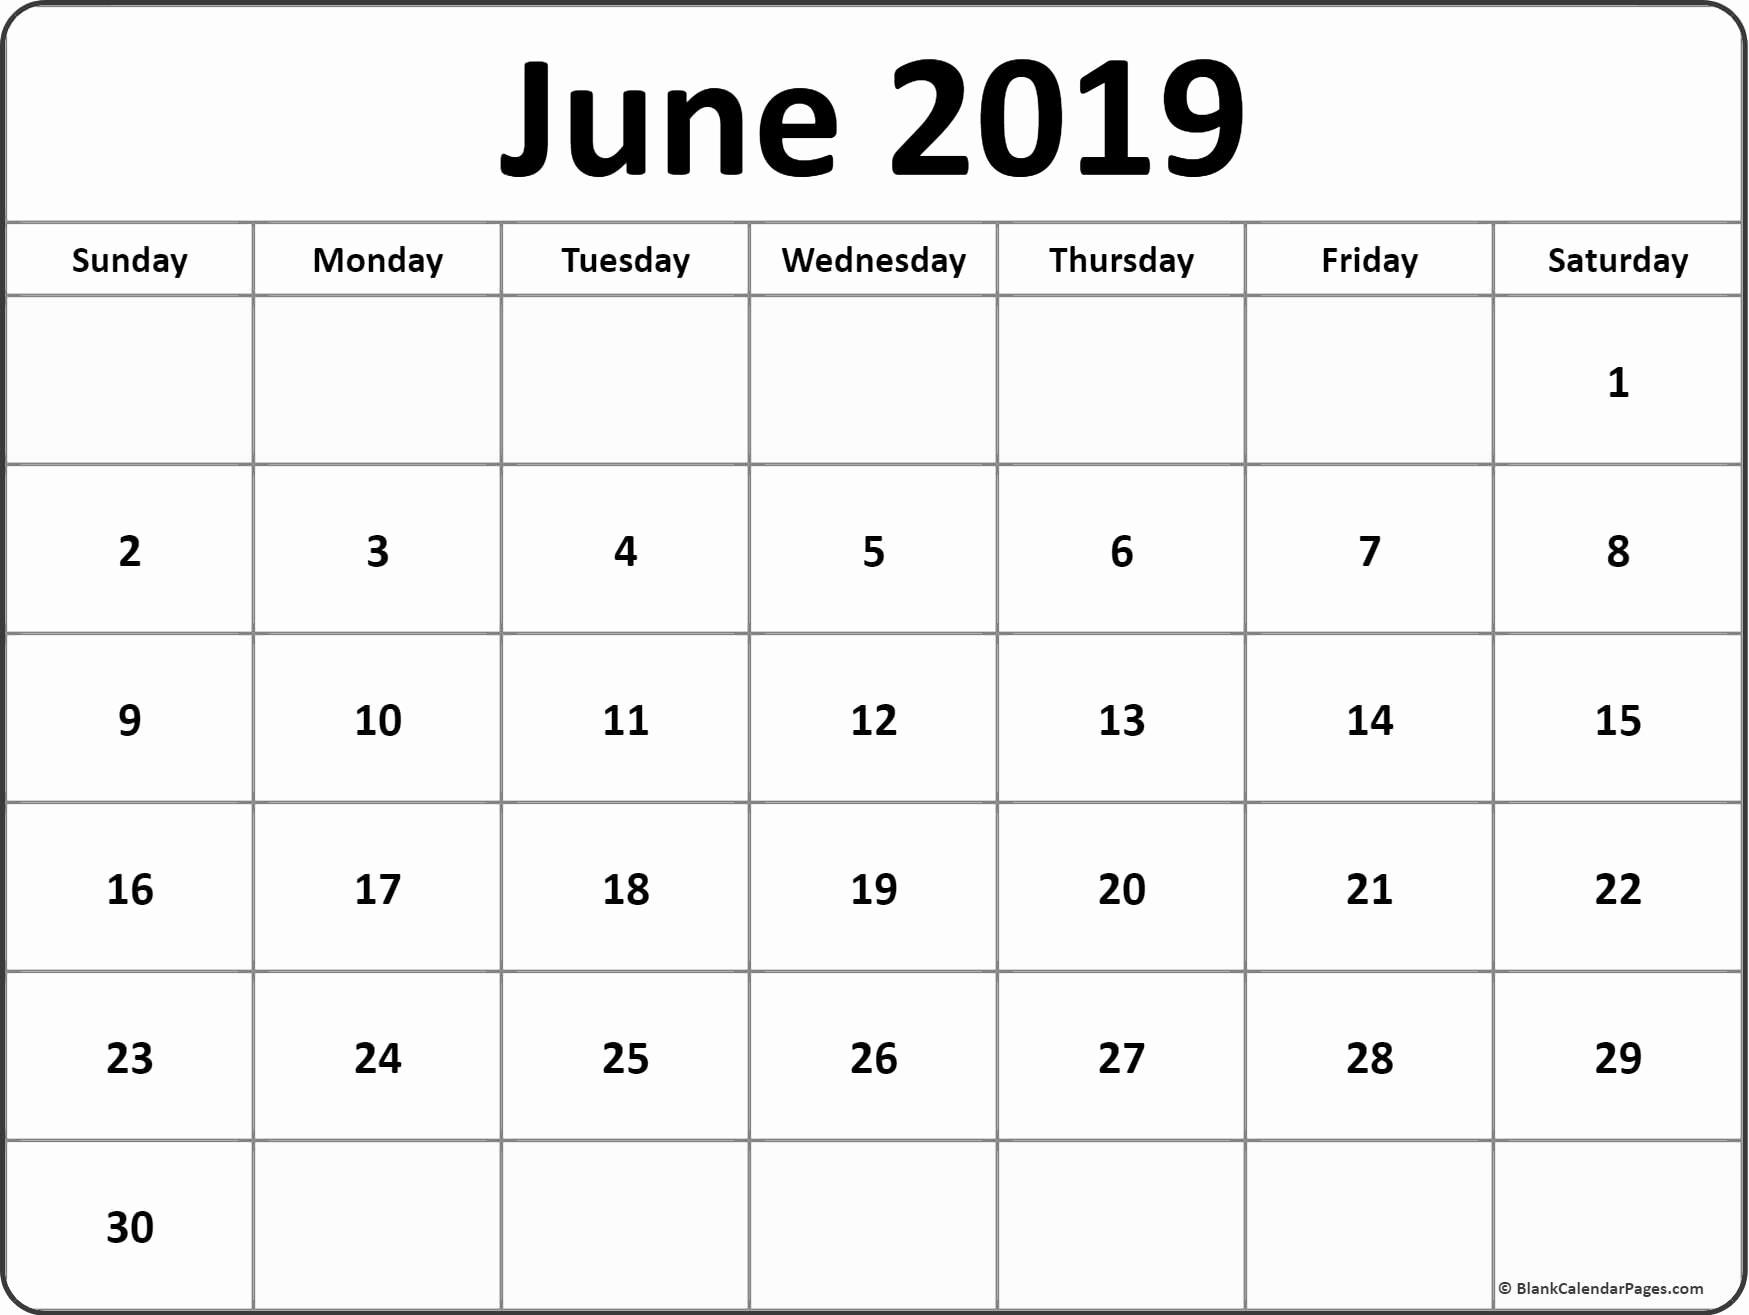 June Calendar 2019 Blank Template